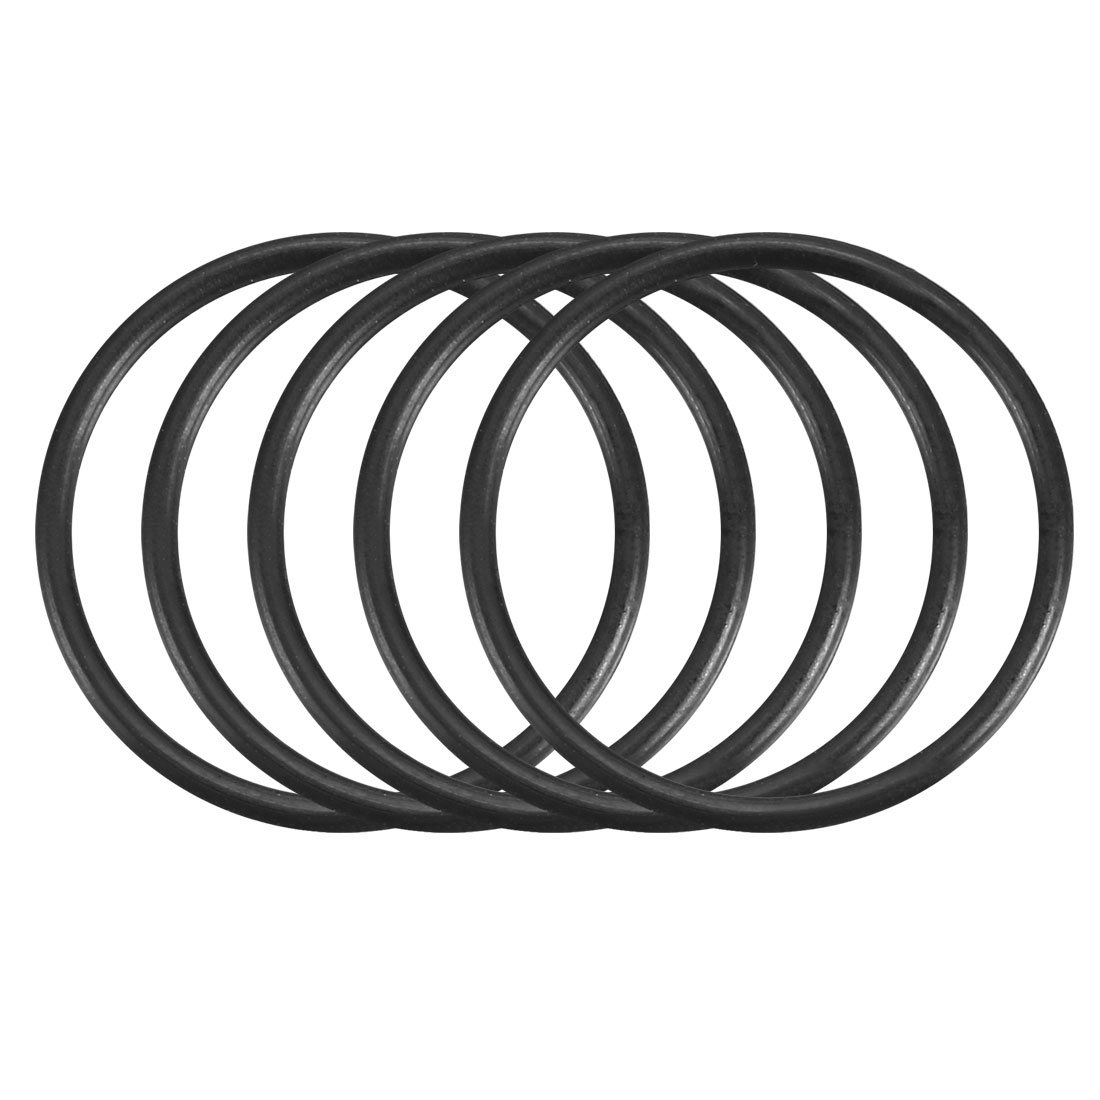 100Pcs Black 18mm x 1.2mm Nitrile Rubber O Ring NBR Oil Sealing Grommets